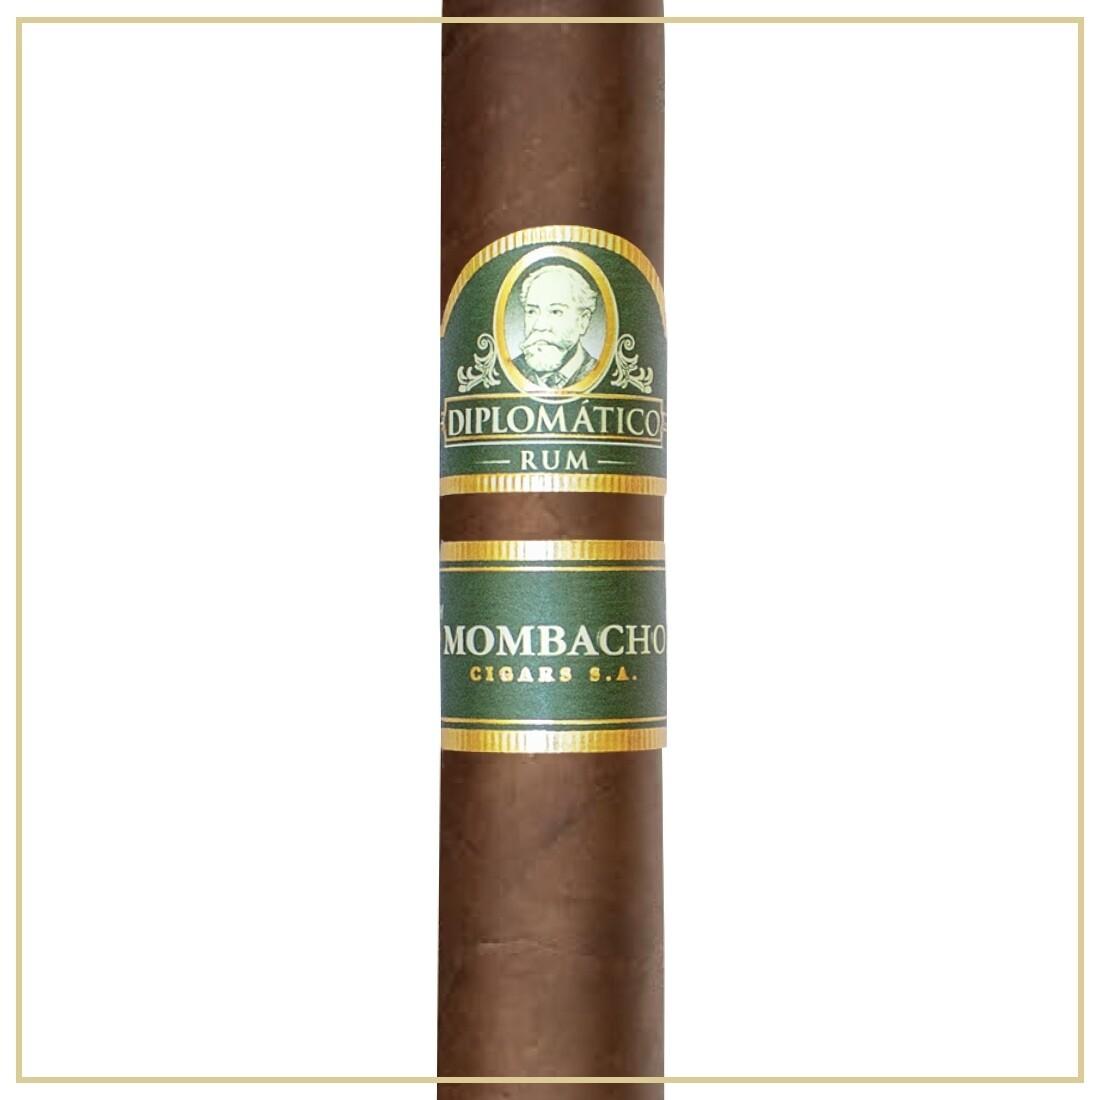 Mombacho Diplomatico Petit Corona 4.5 x 44 Single Cigar